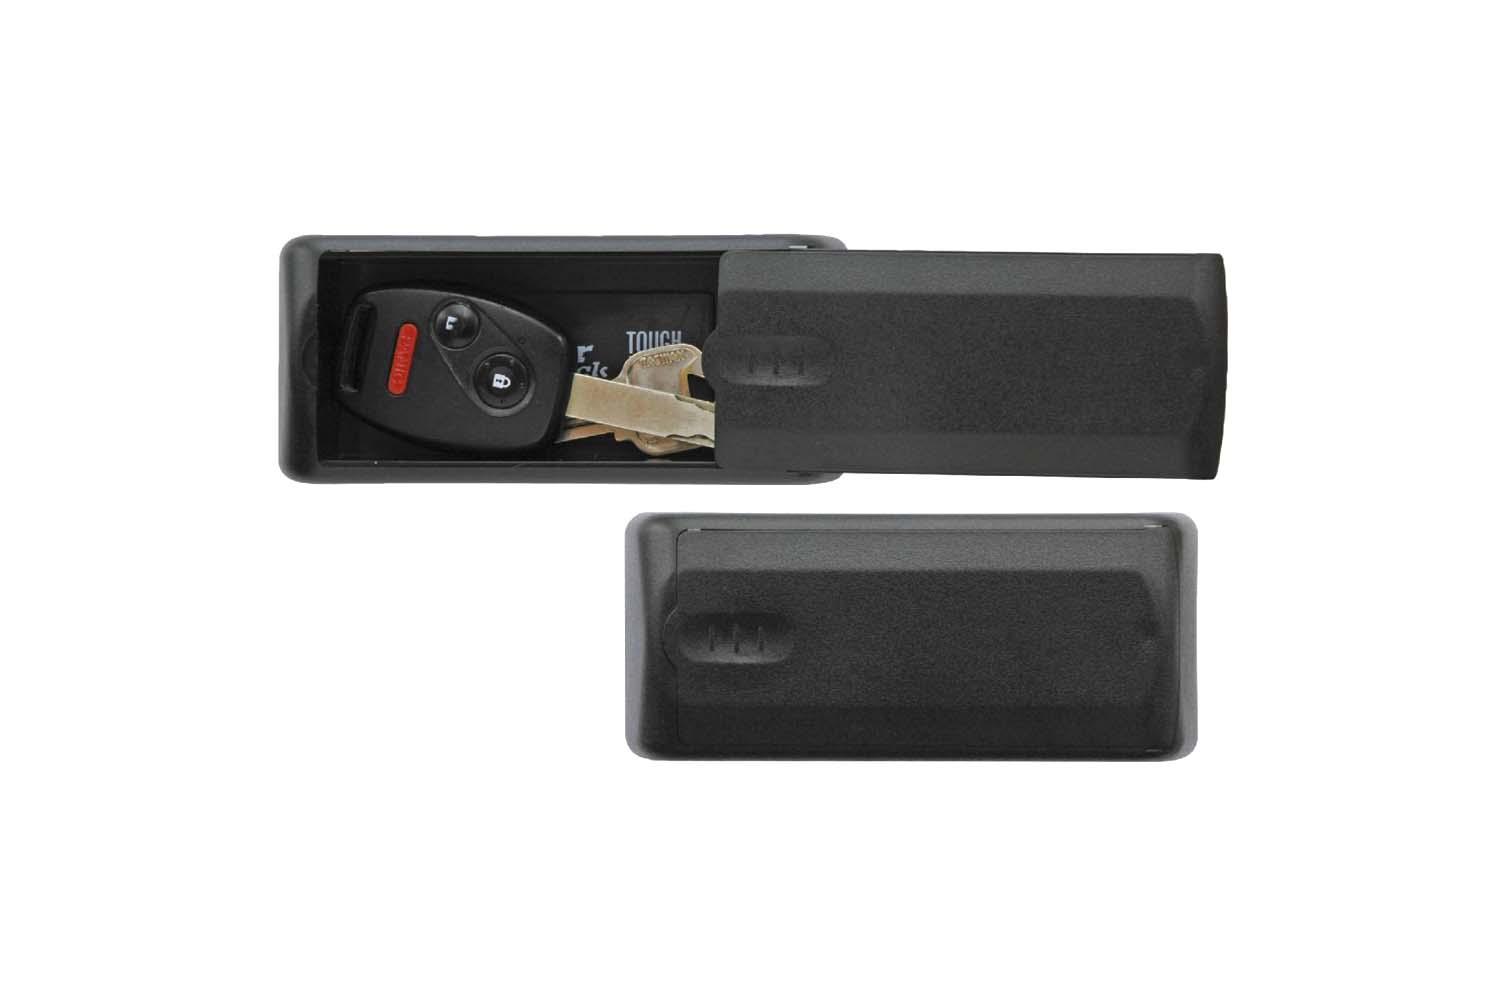 Magnetic Hide-A-Key - 4.5 Stars - $4 (Prime)